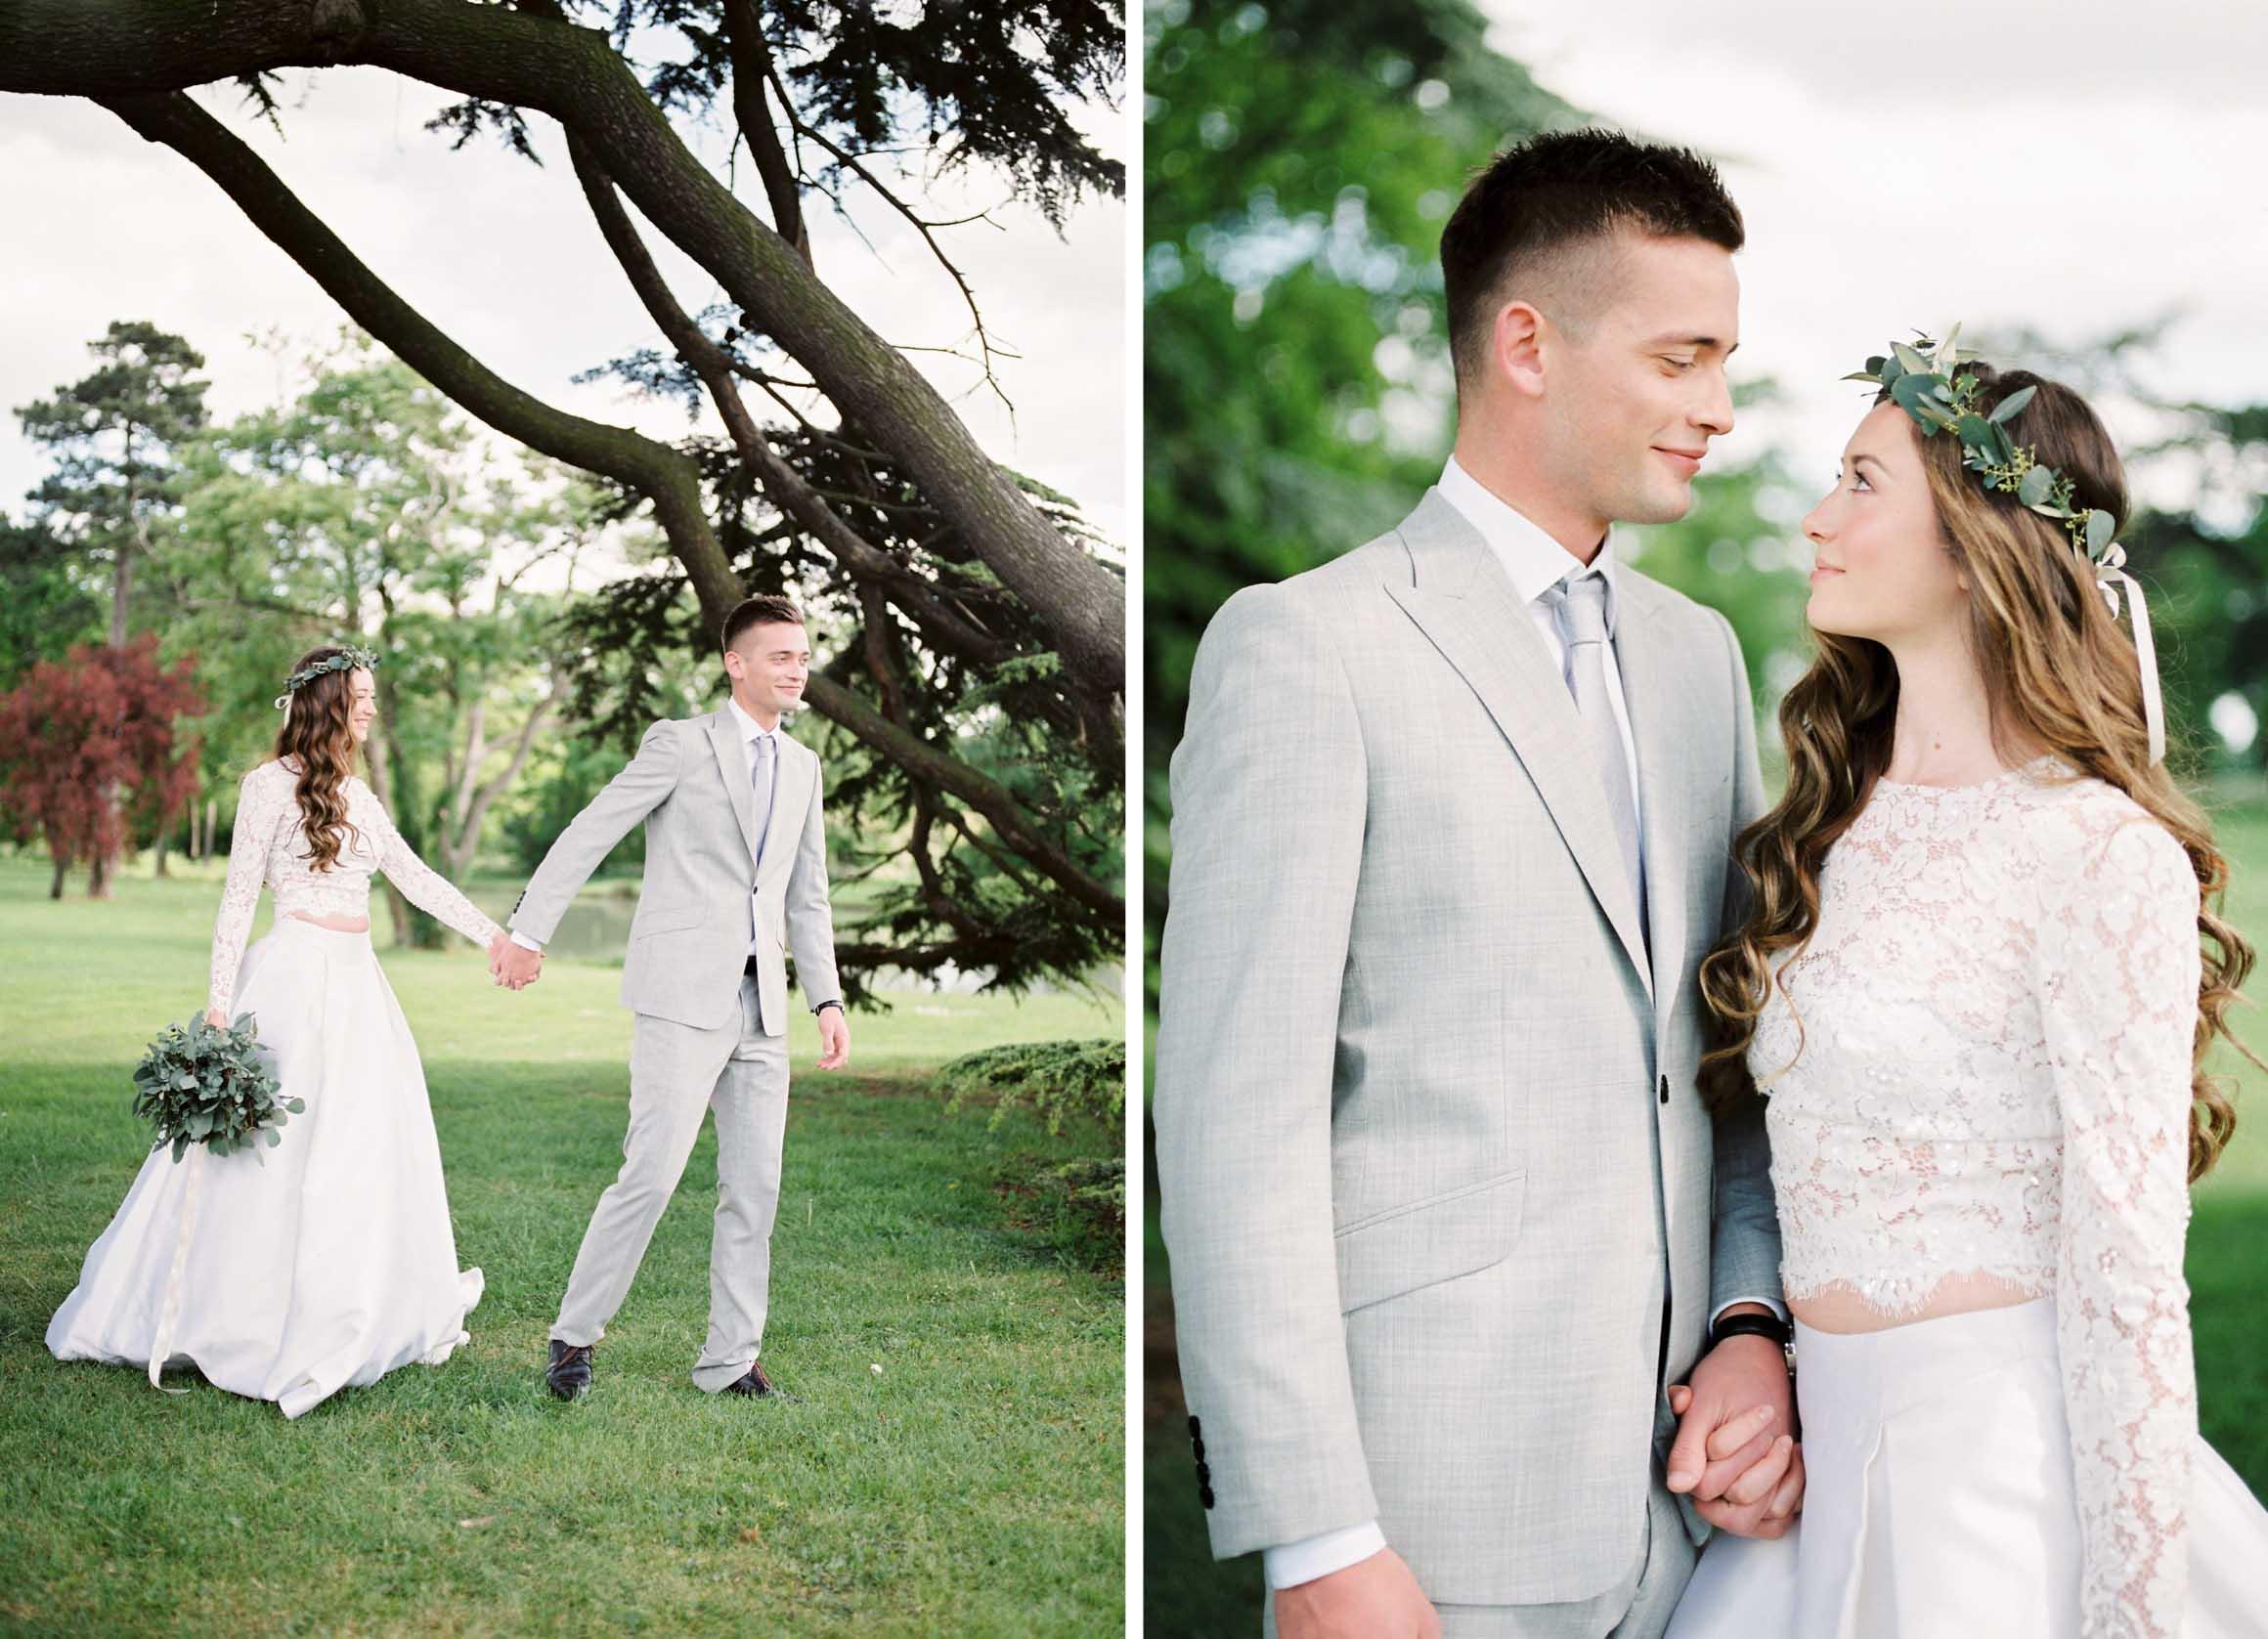 Amy O'Boyle Photography- Destination & UK Fine Art Film Wedding Photographer- Stubton Hall Wedding Shoot 2.jpg